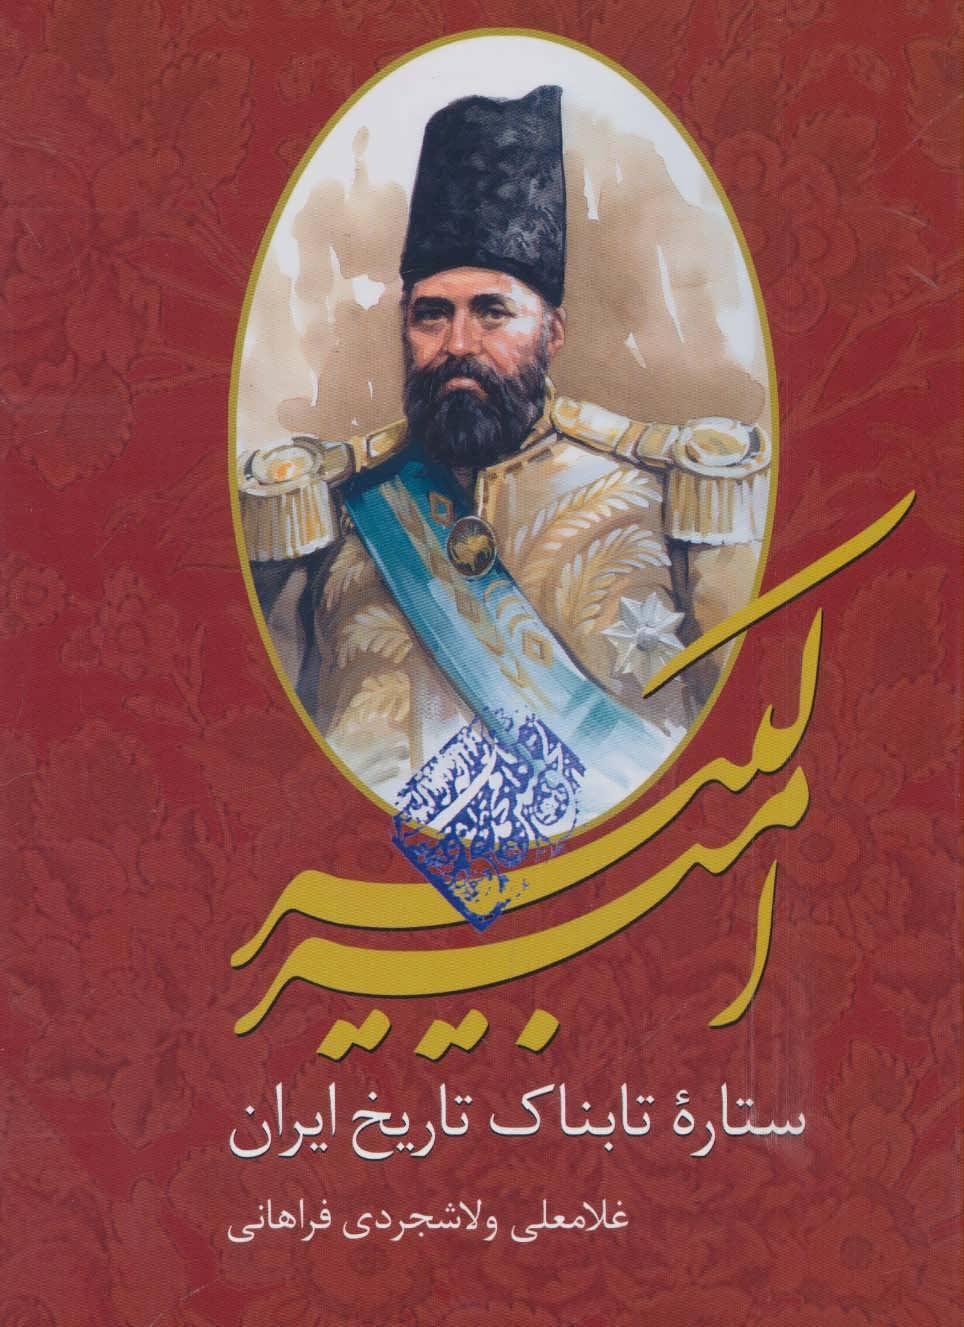 اميركبير (ستاره تابناك تاريخ ايران)